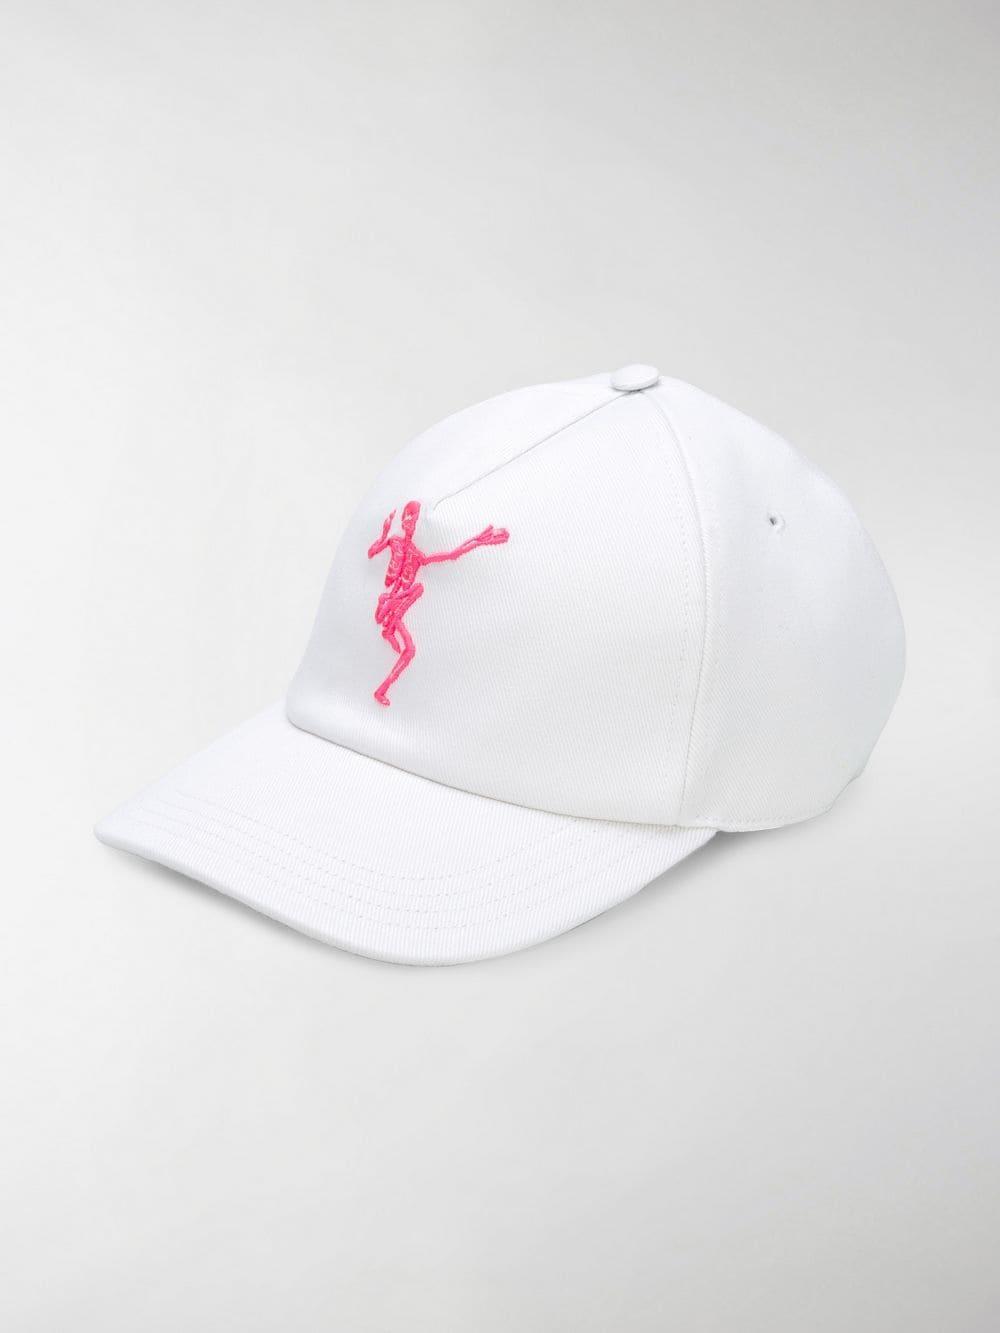 cc6bdc7aab67a3 Alexander McQueen Skeleton Baseball Cap in White for Men - Save 75 ...